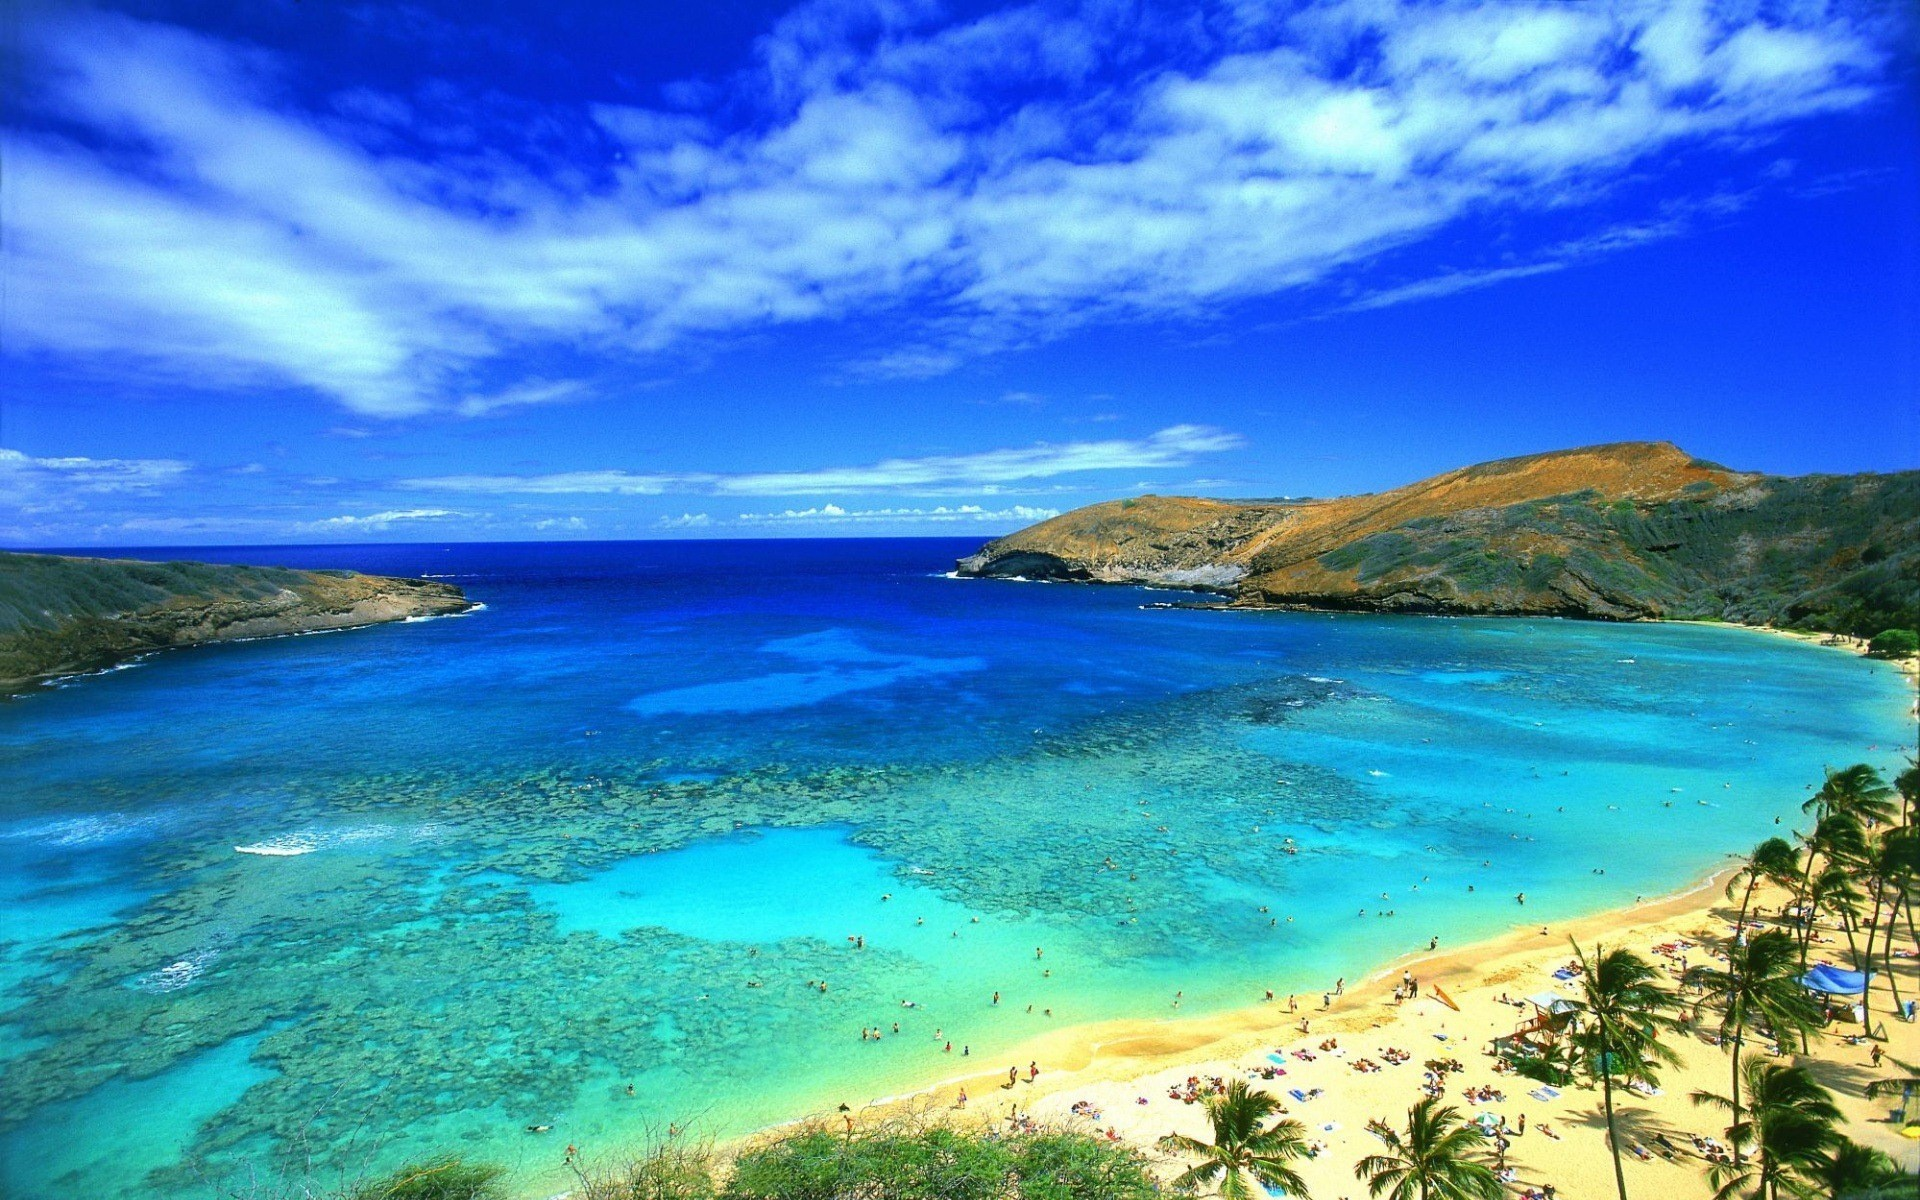 hawaii screensavers wallpaper 56